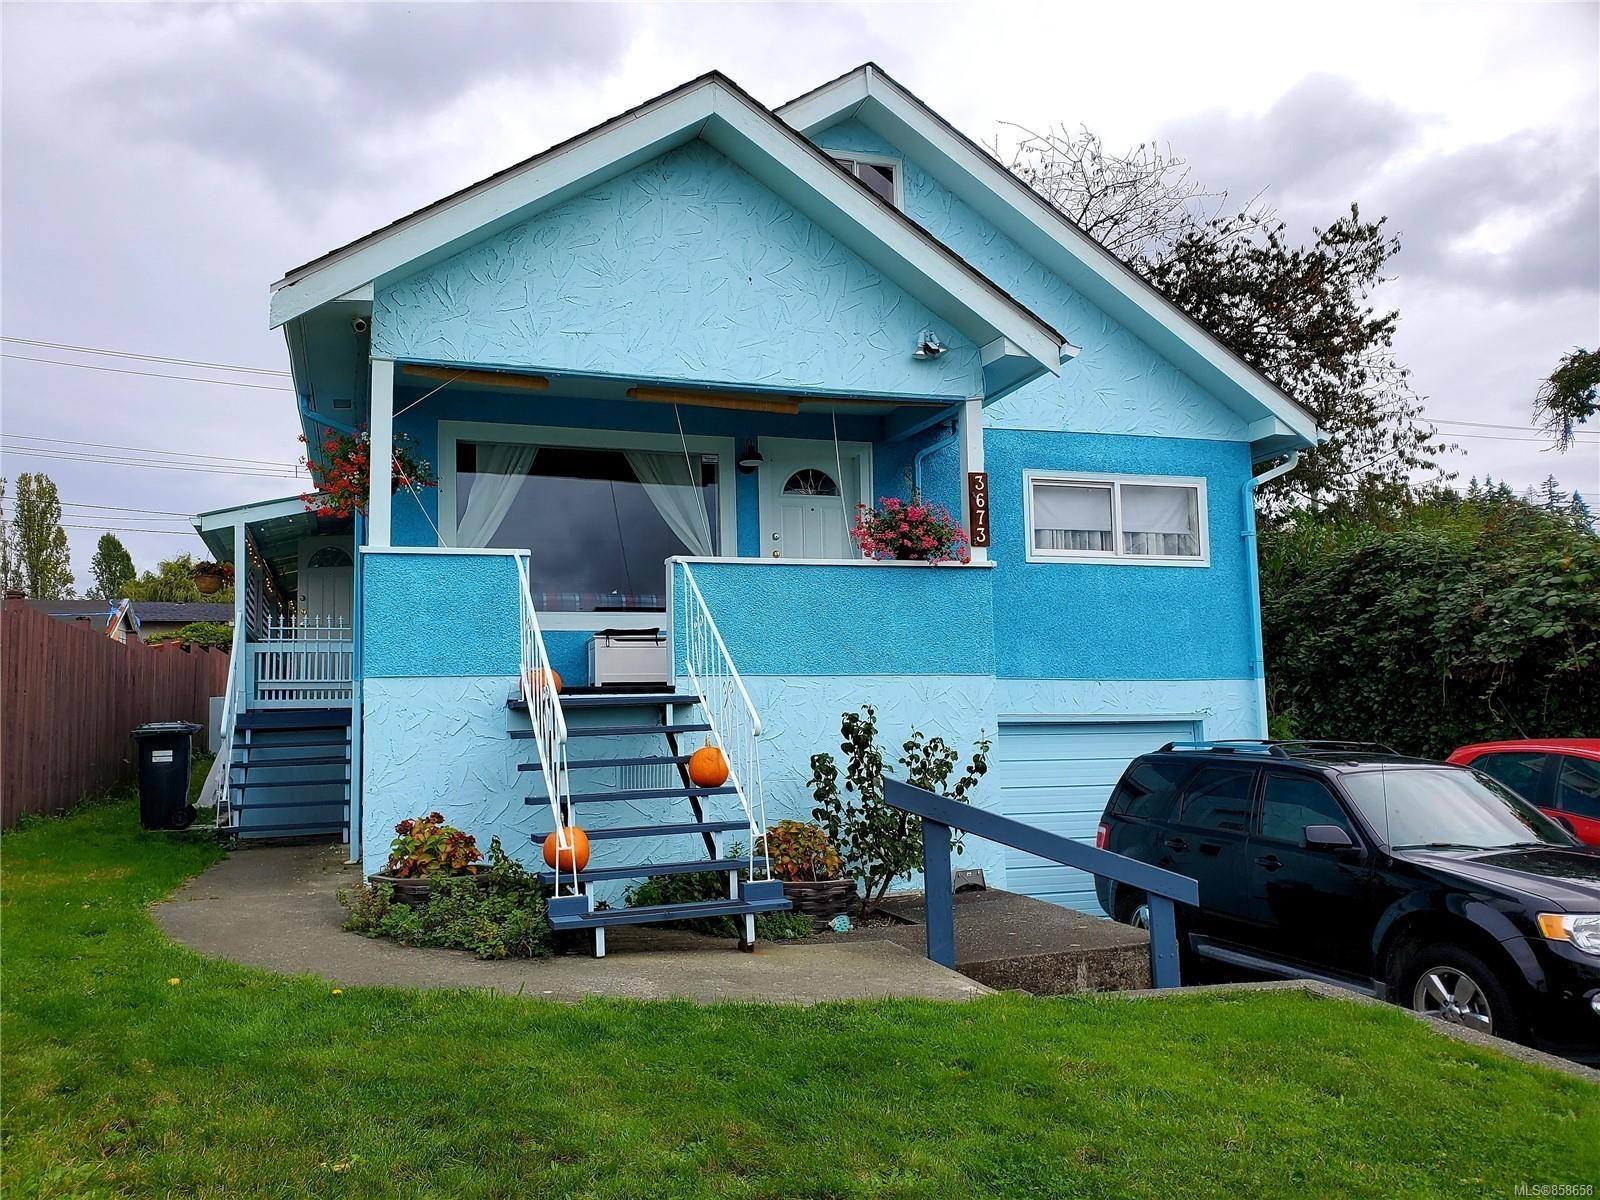 Main Photo: 3673 5th Ave in : PA Port Alberni House for sale (Port Alberni)  : MLS®# 858658